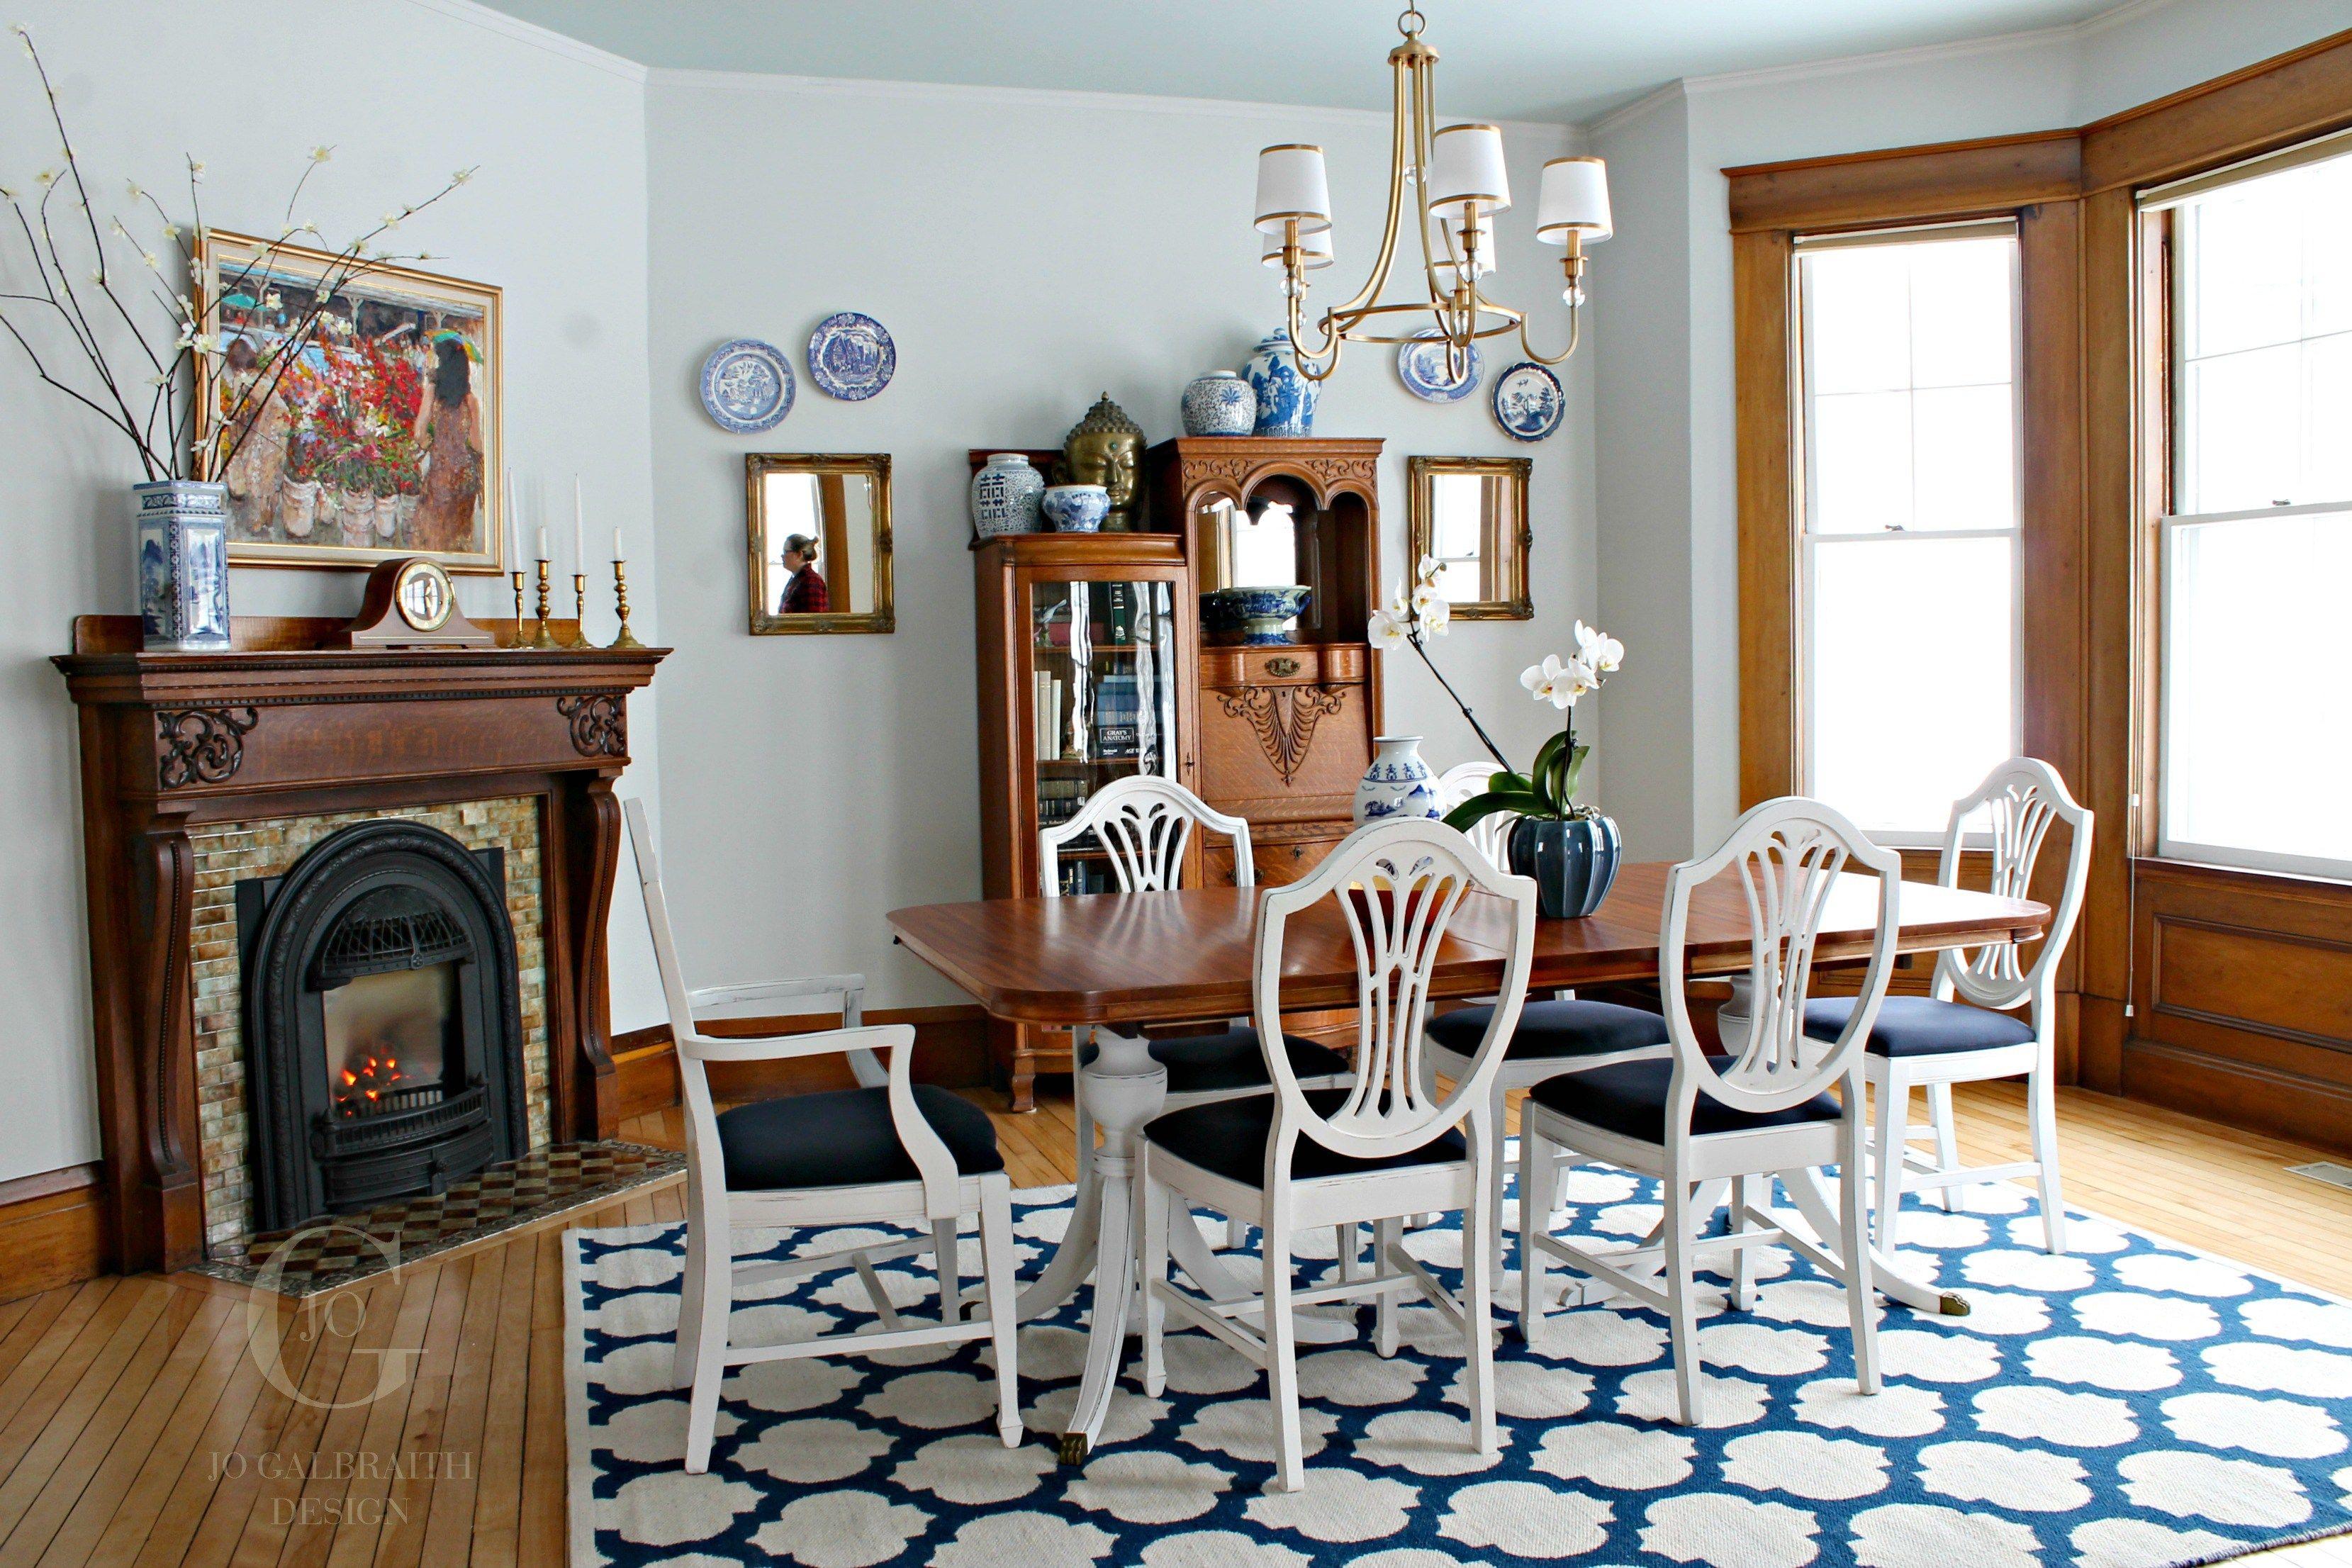 Pin On Diy Home #wickham #gray #living #room